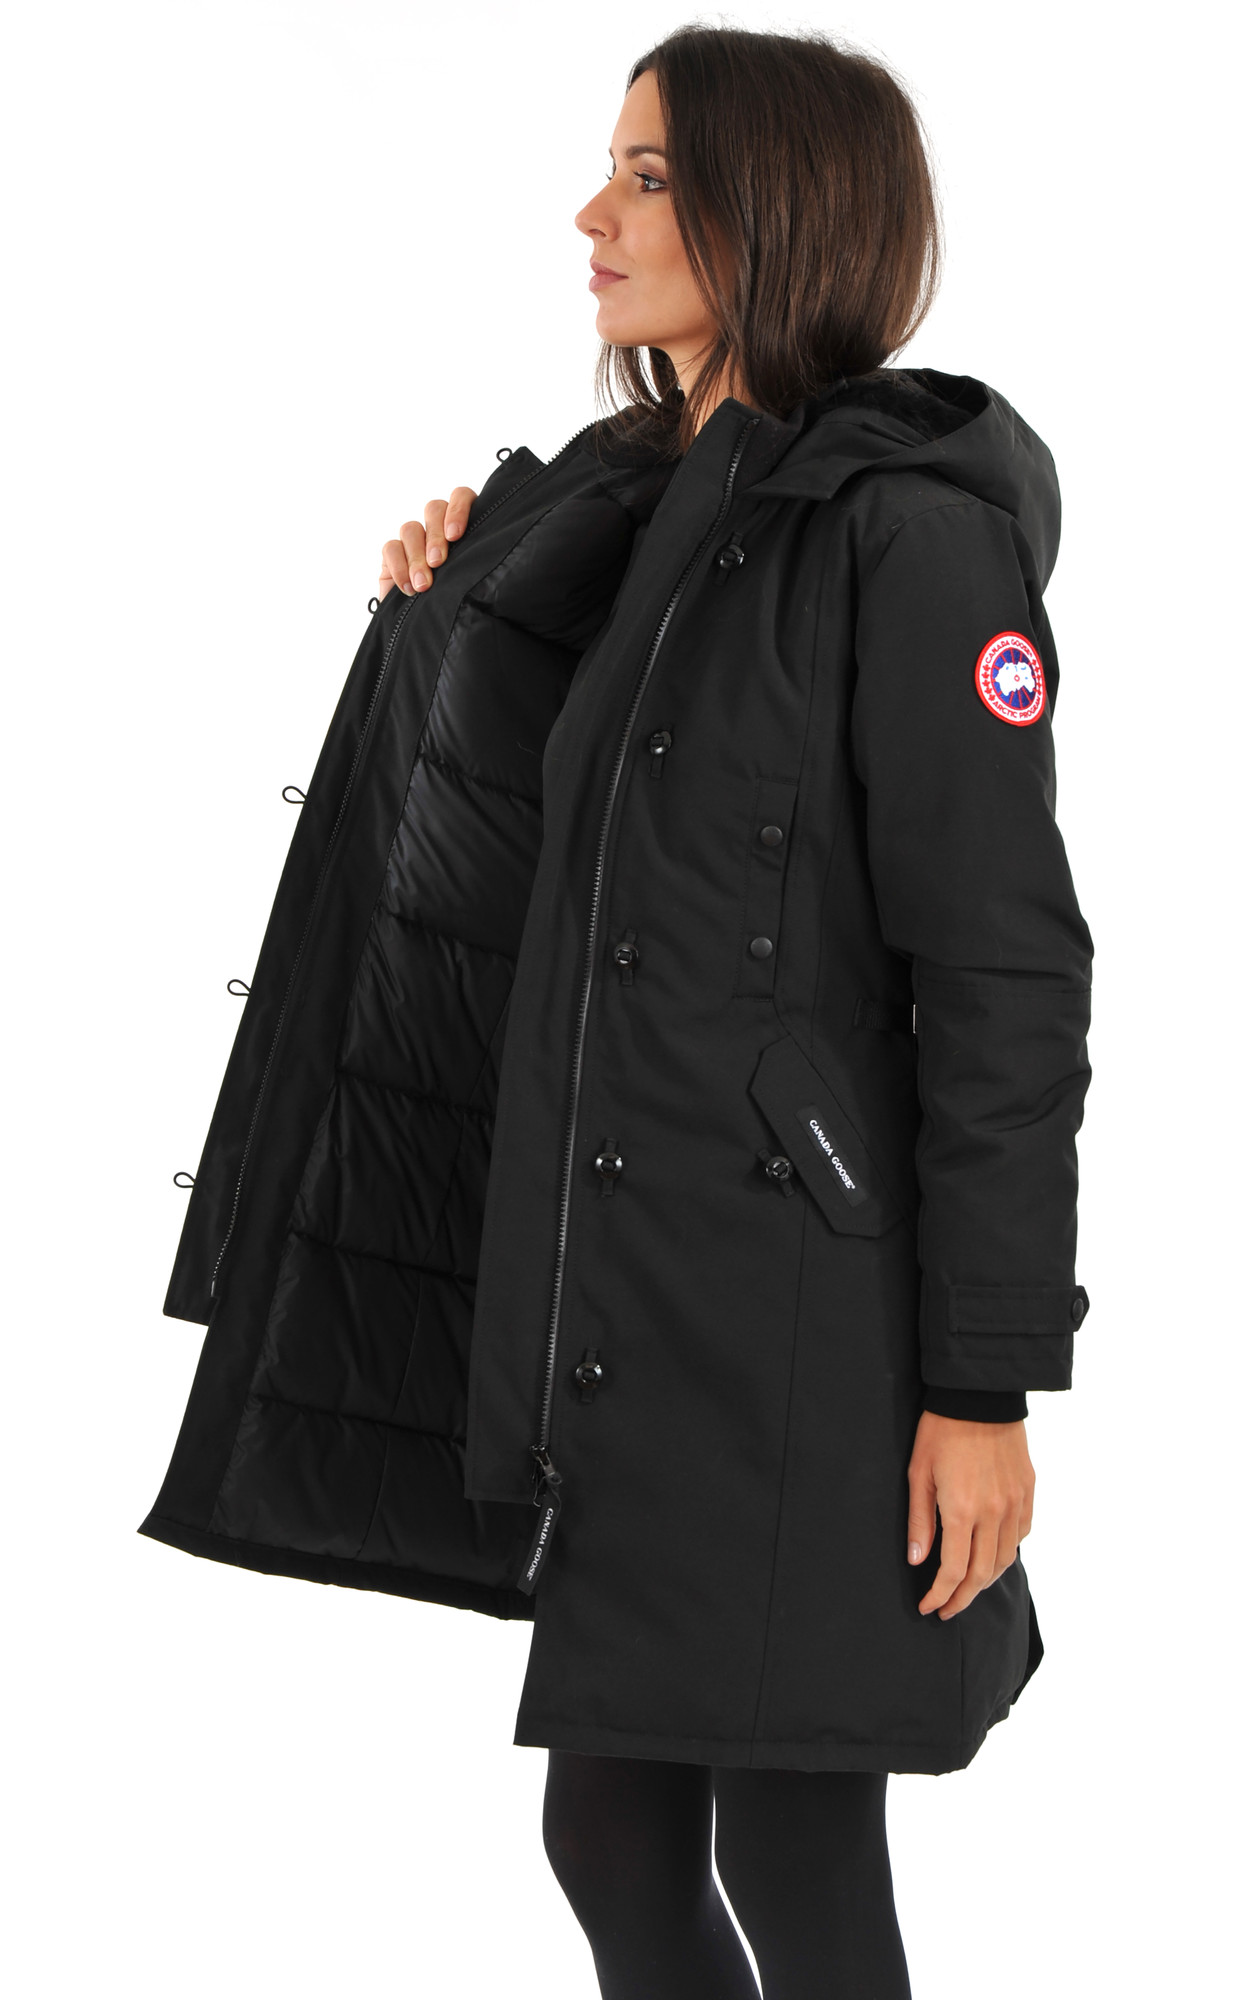 Manteau doudoune femme canada